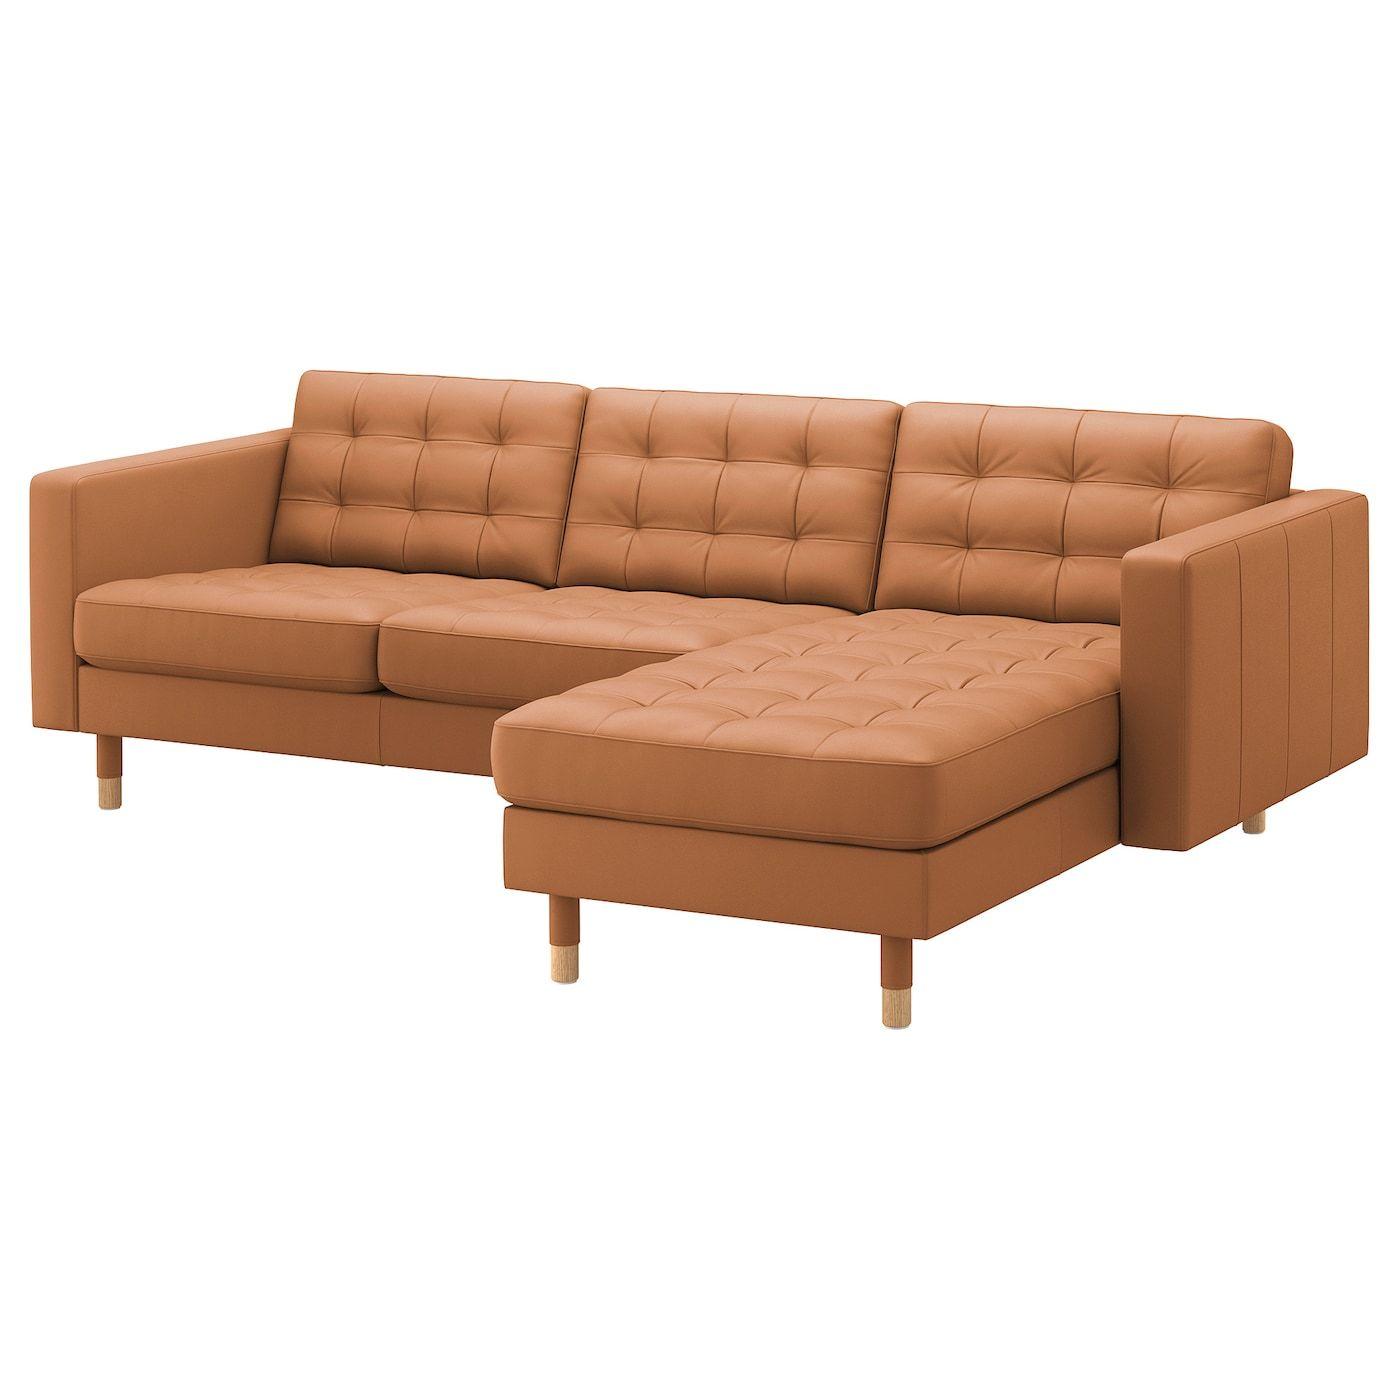 Ikea Canape 3 Places In 2020 Ikea Ledersofa Kunstleder Sofa Couch Leder